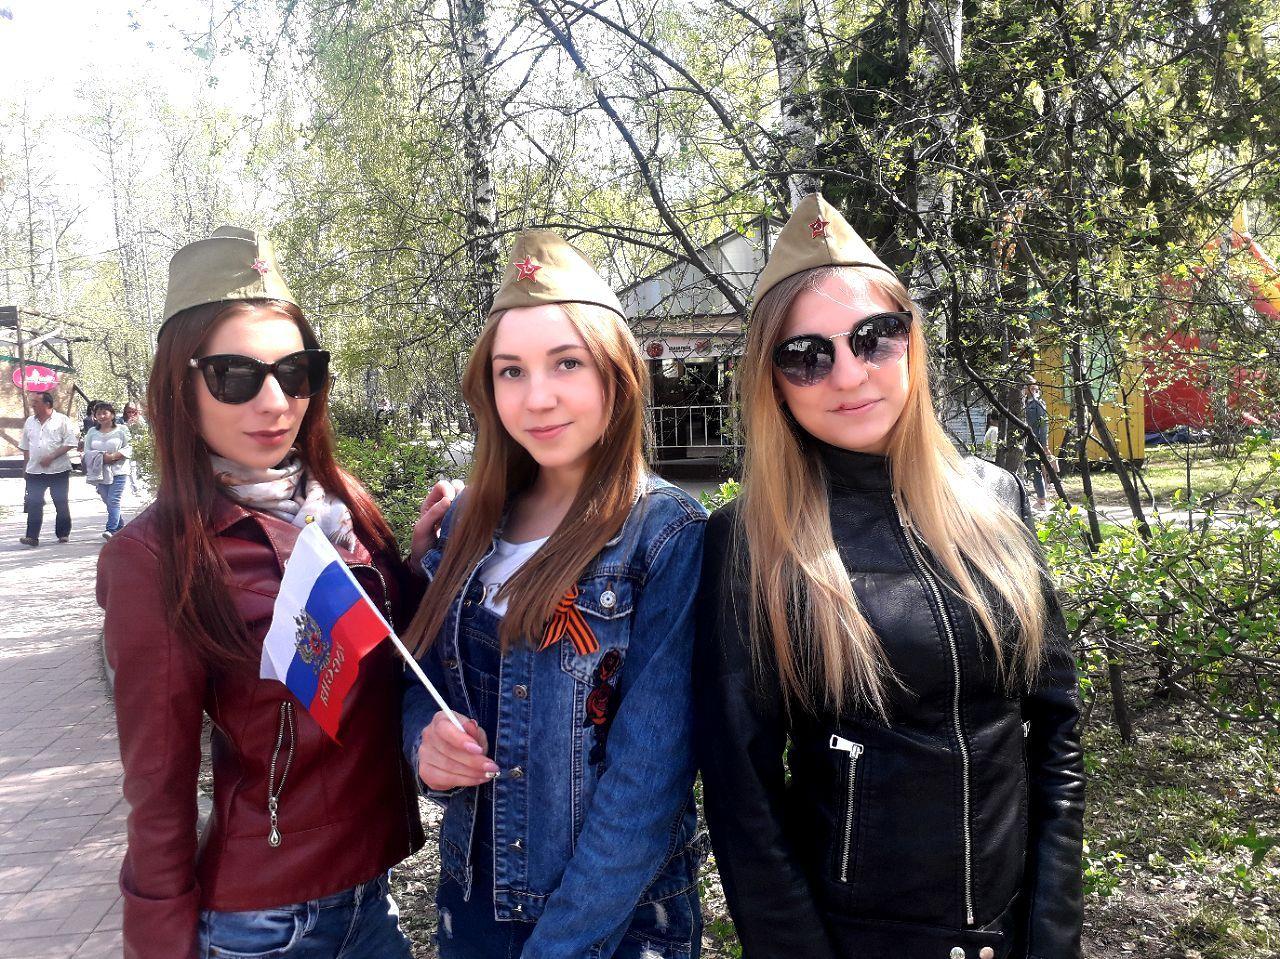 Салют, Победа: онлайн-репортаж — как Новосибирск праздновал 9 Мая